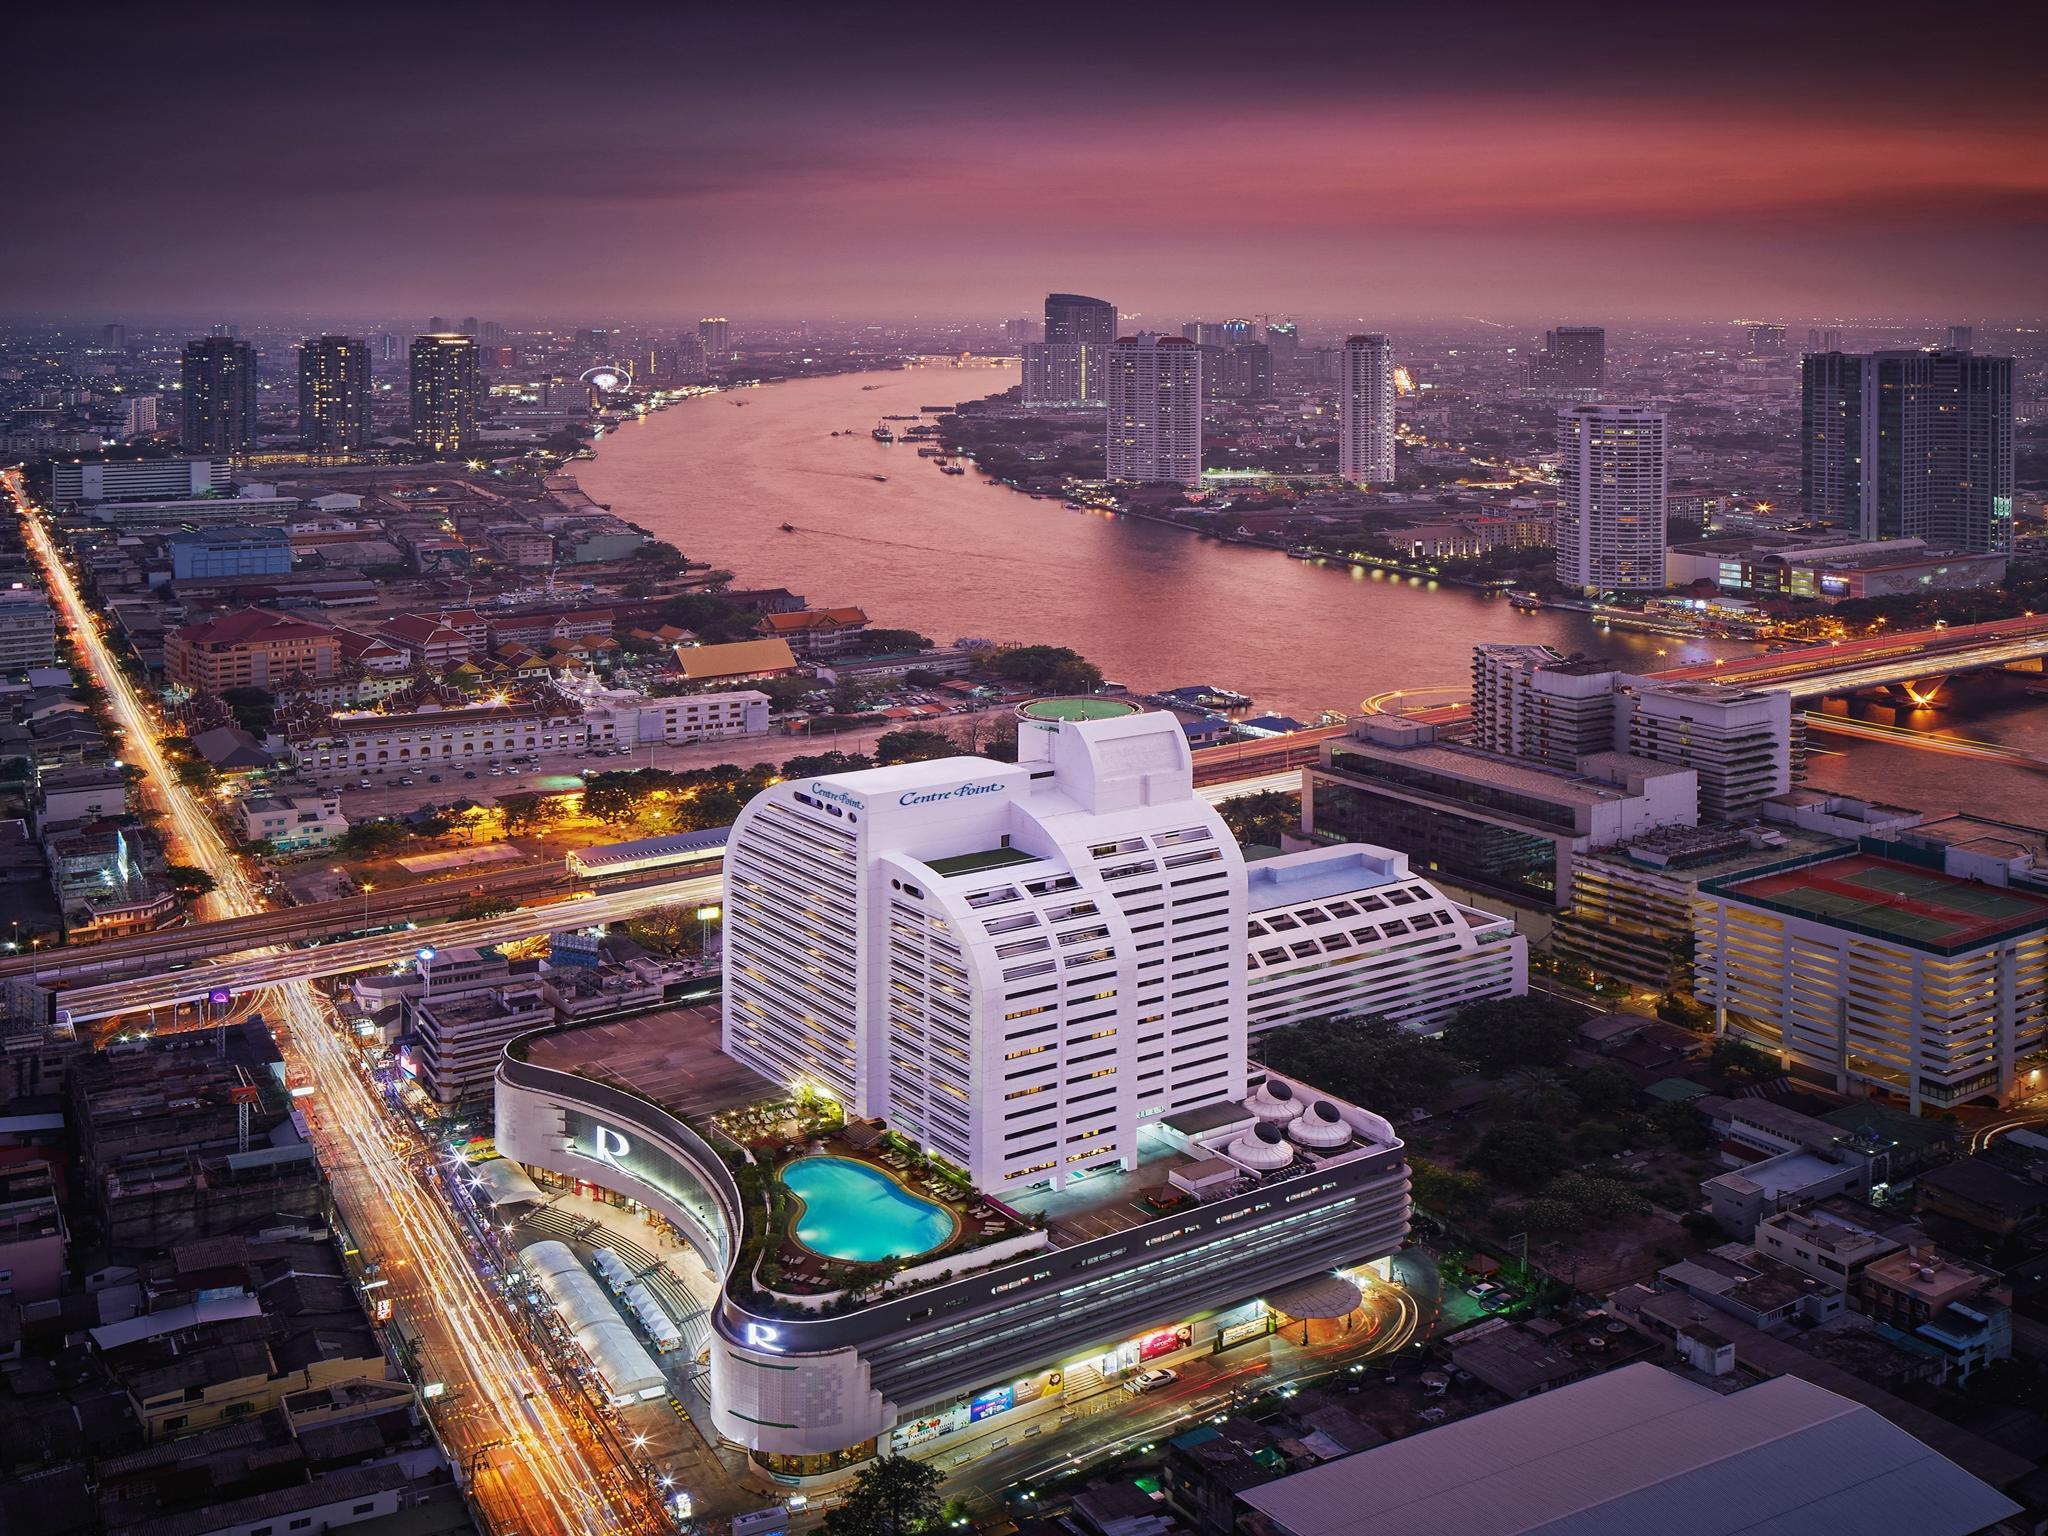 Centre Point Silom River View Hotel. โรงแรมเซ็นเตอร์ พอยต์ สีลม